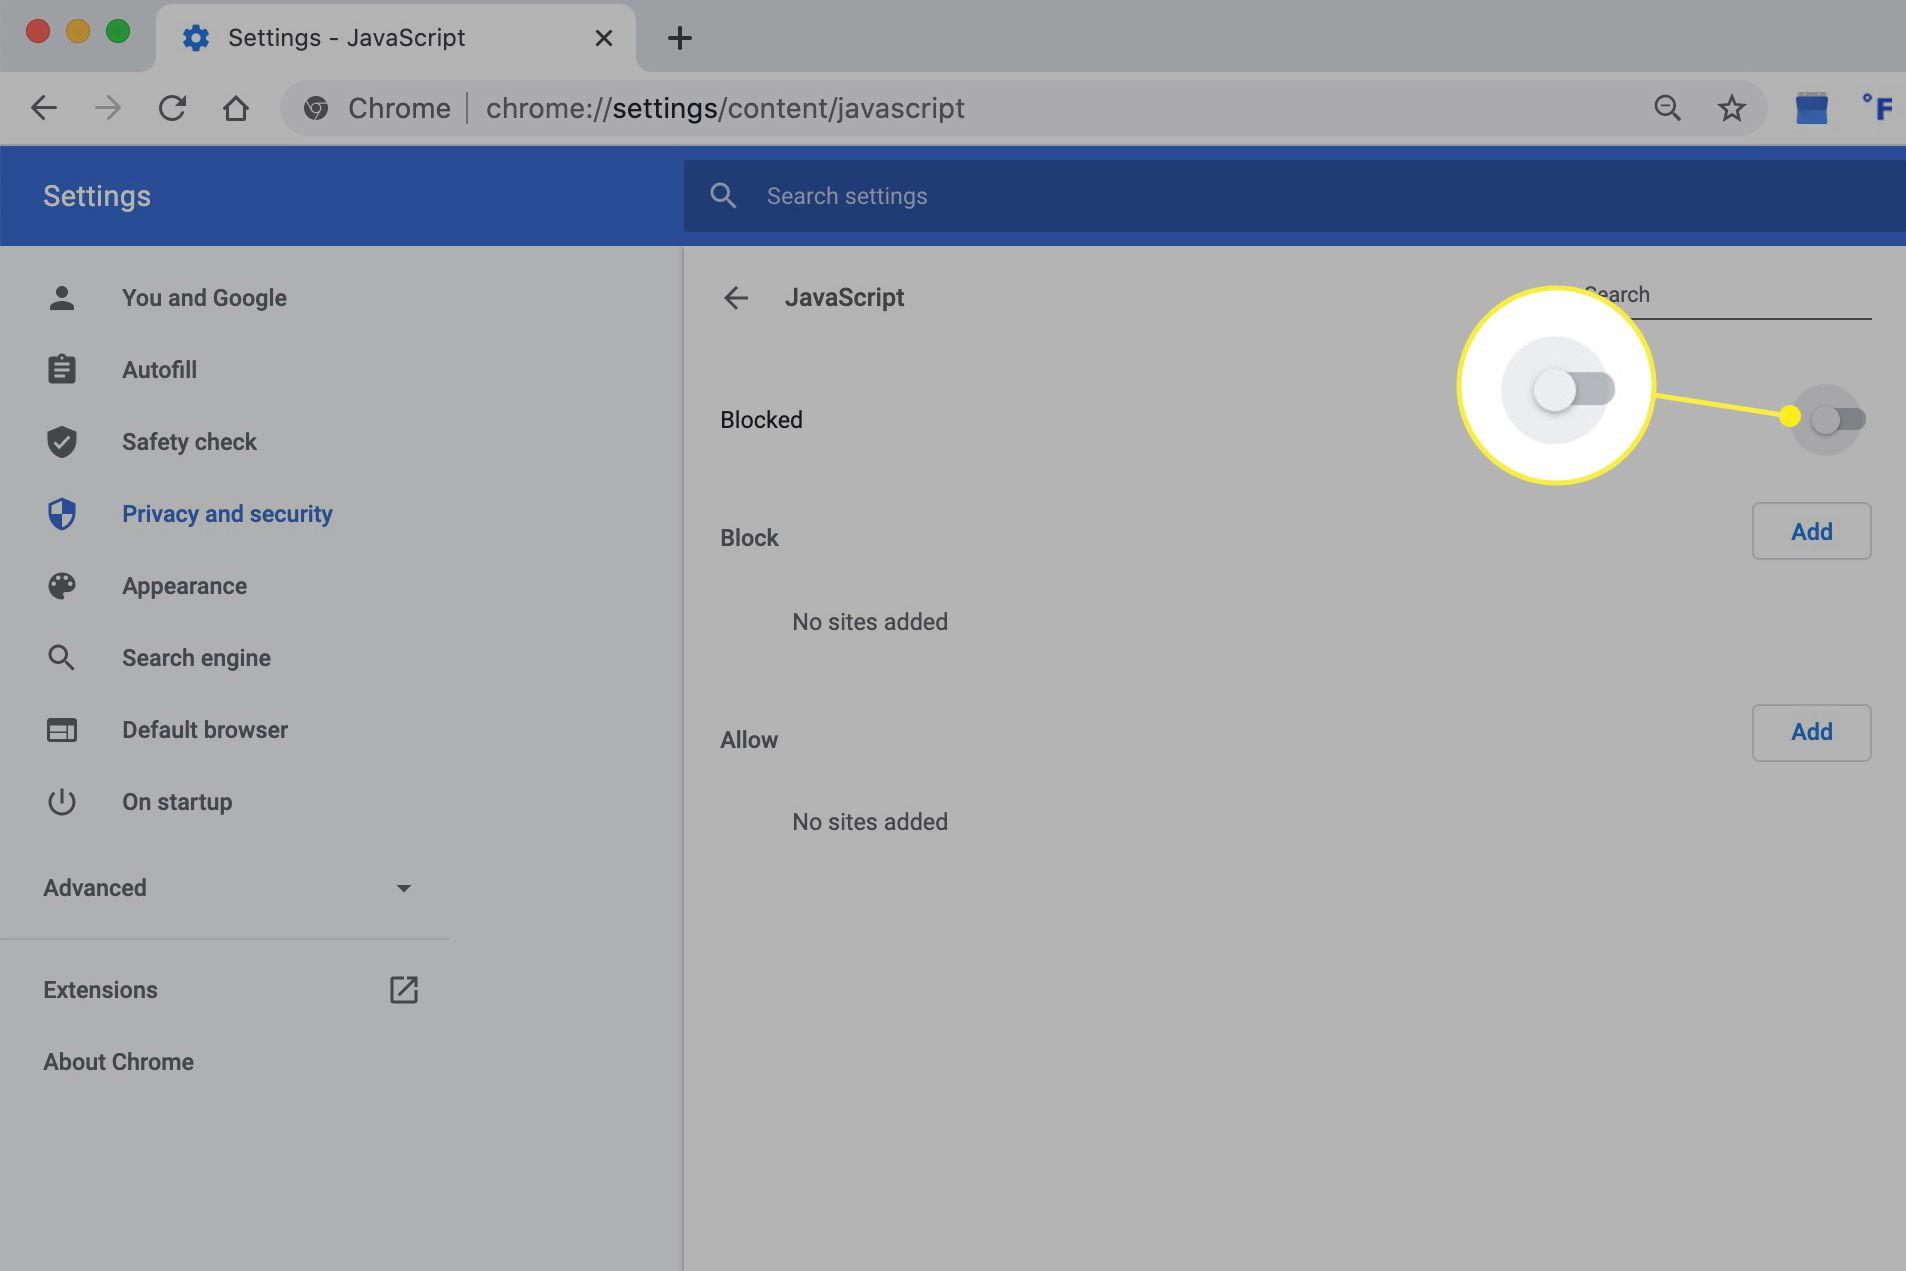 Blocking Java in Chrome